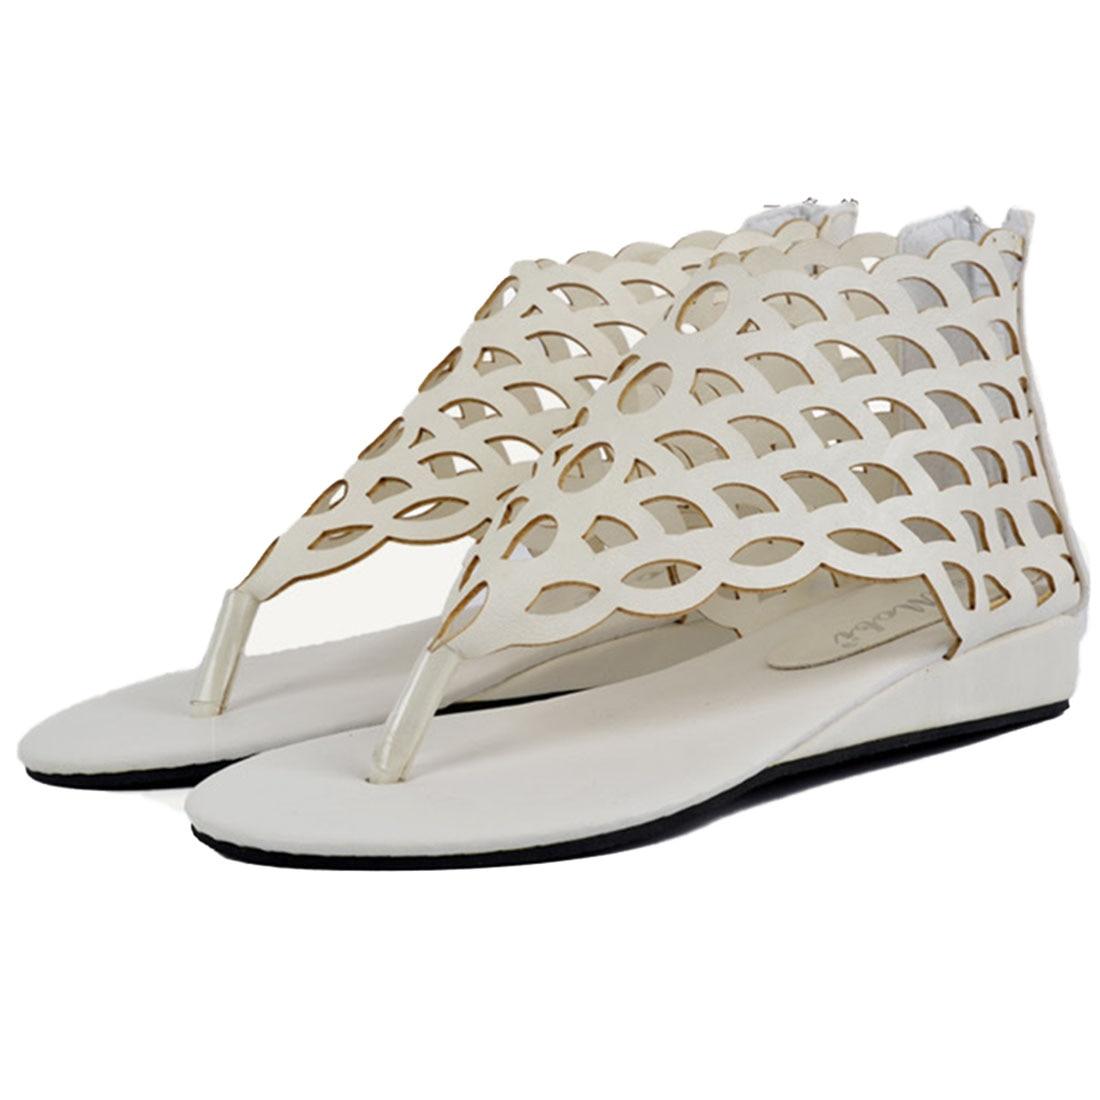 yjsfg house 2017 fashion women's shoes gladiator flats open toe